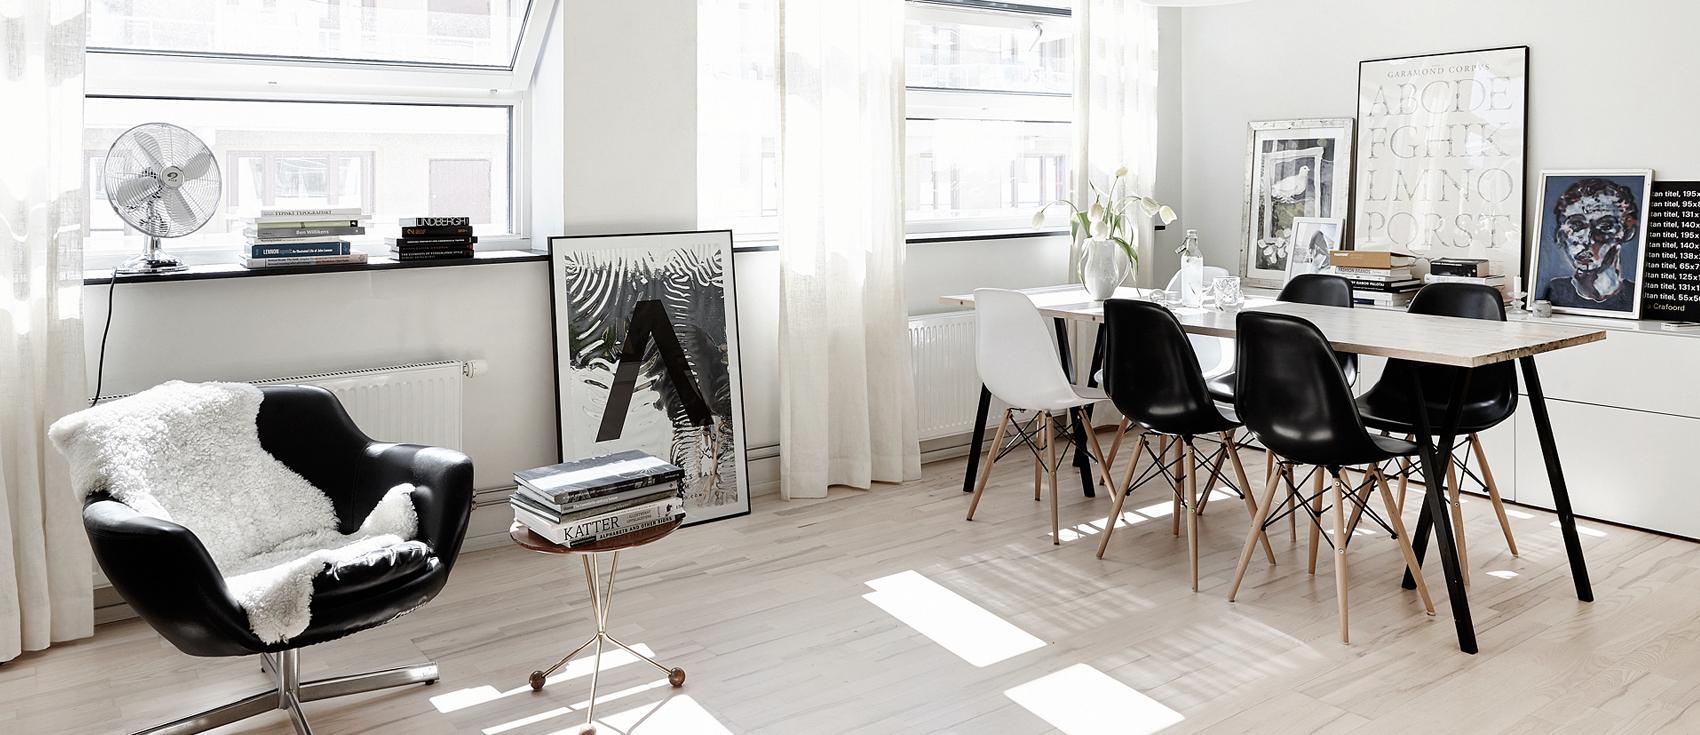 Scandinavian Decorating scandinavian decor & decorating ideas | buyer select